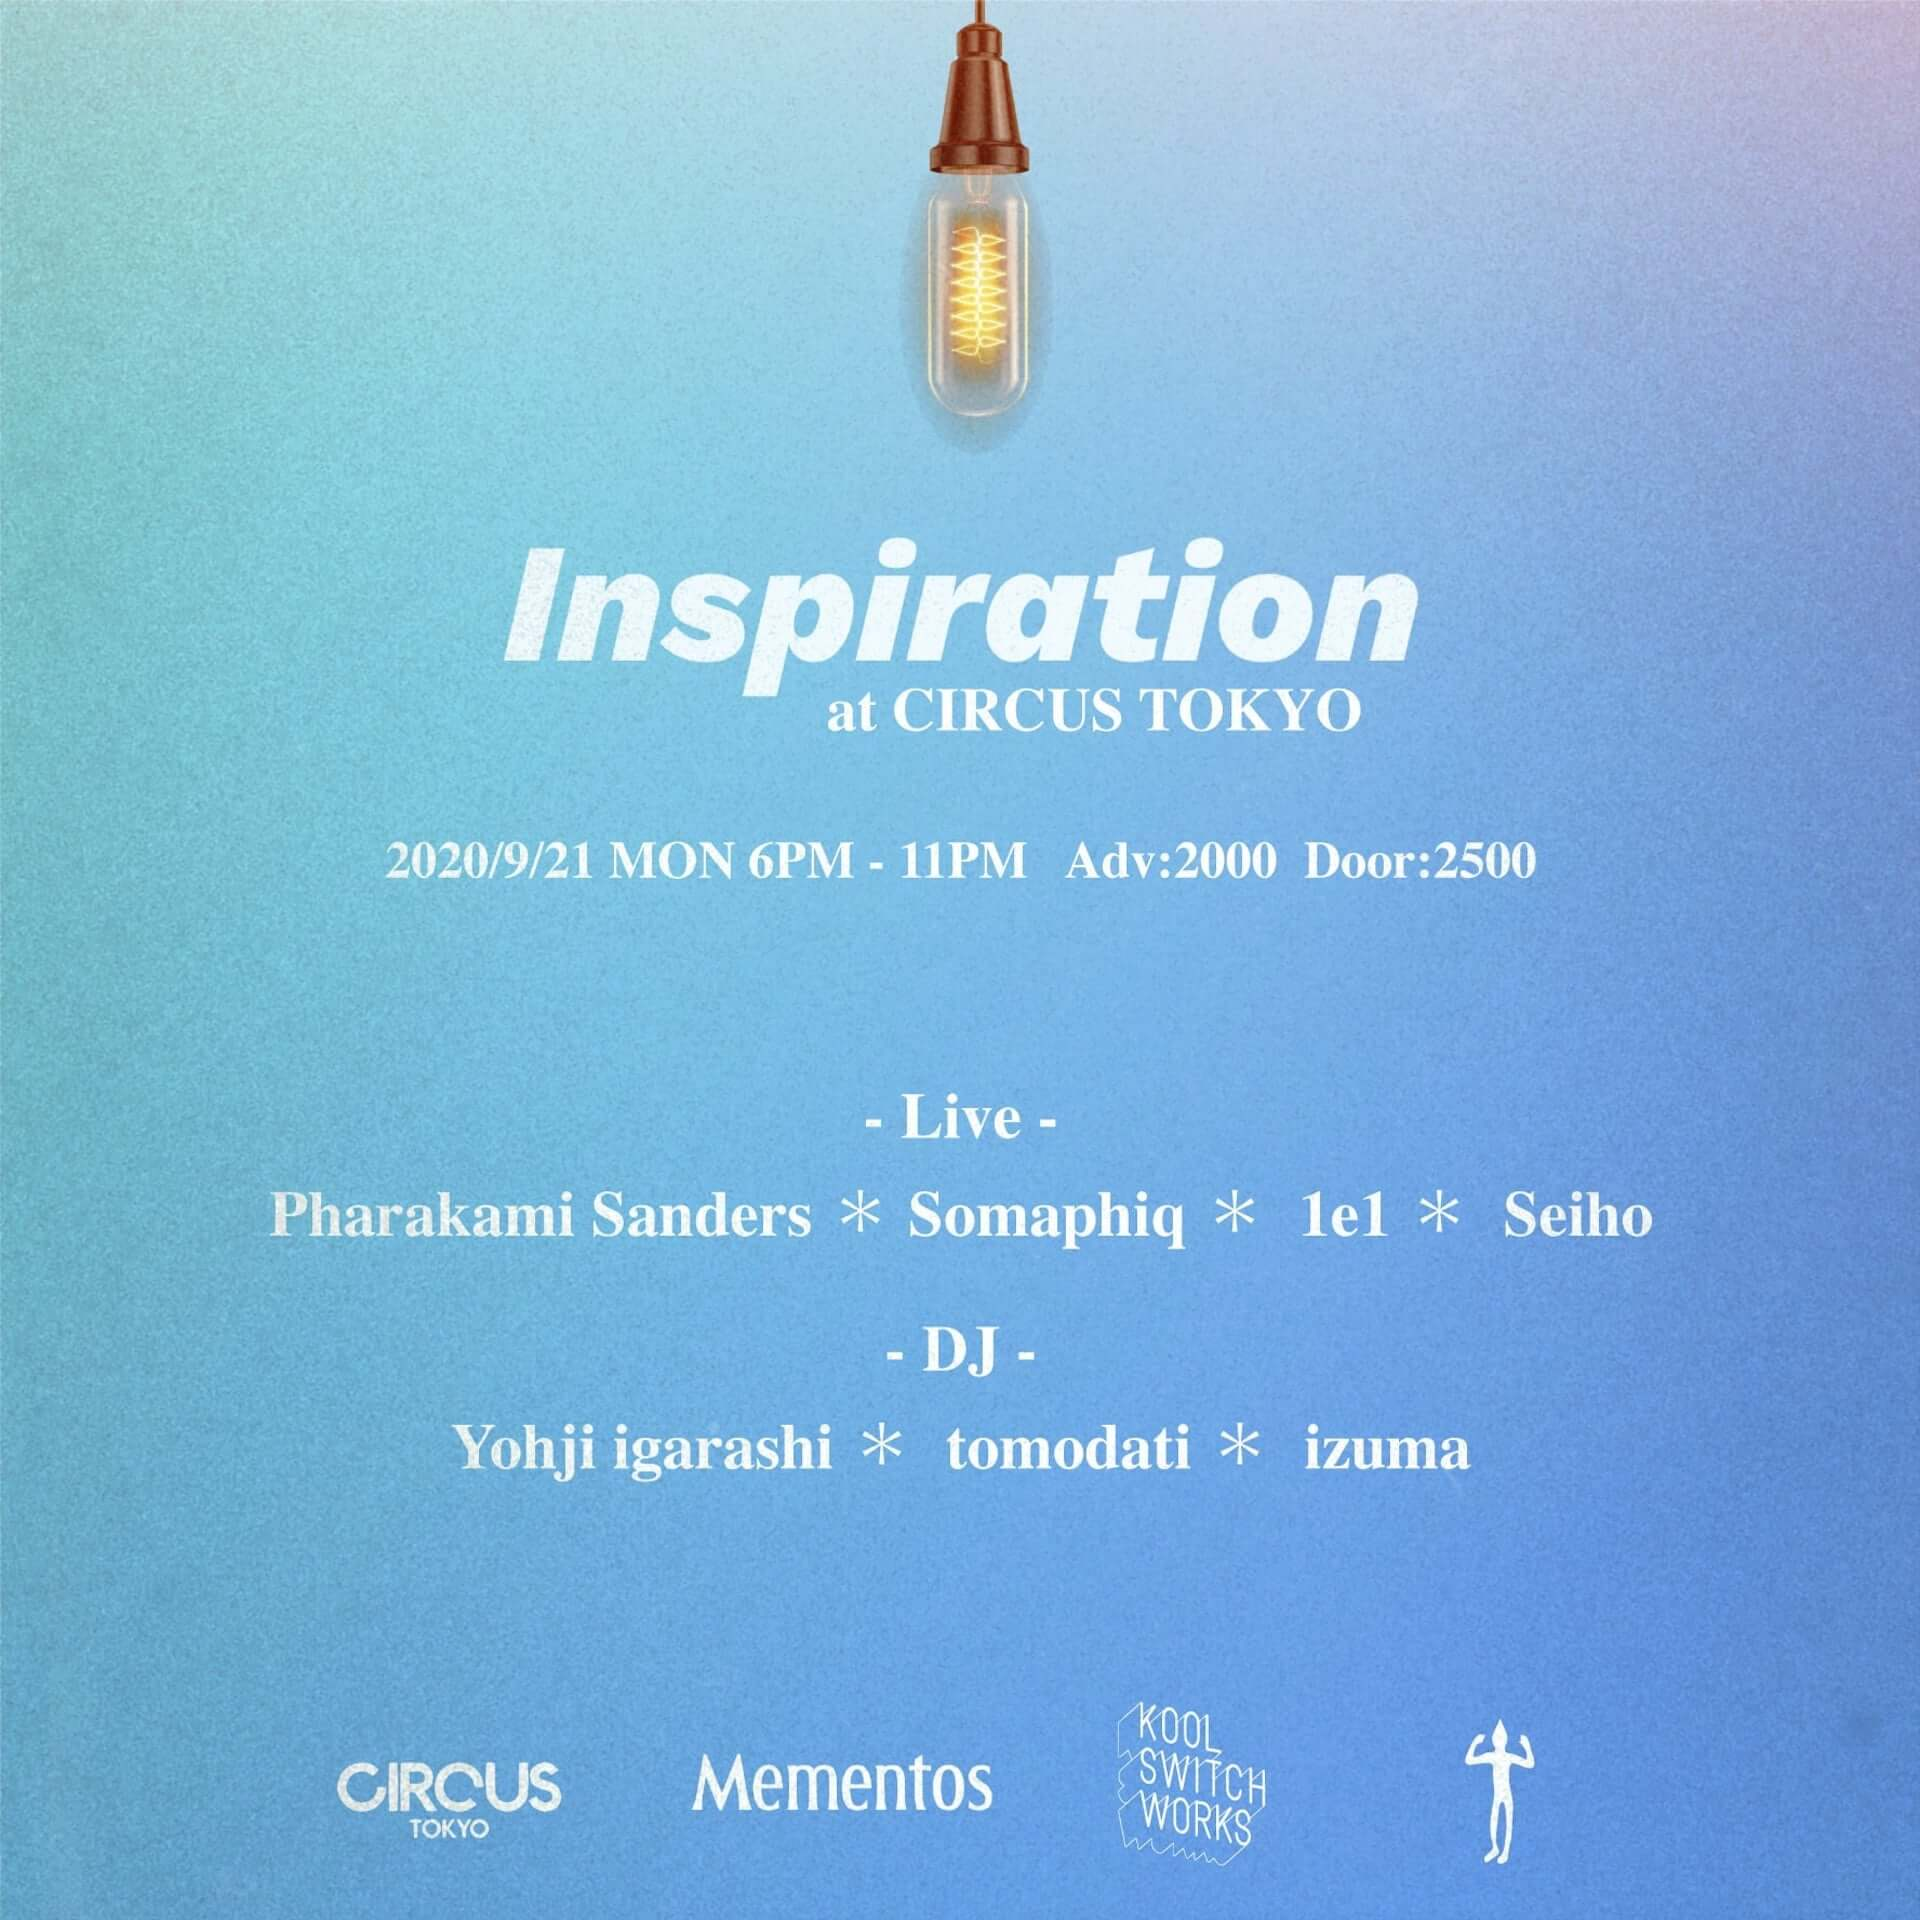 Seihoと〈Mementos〉がキュレーション!1e1、Yohji Igarashiら7組が出演するライブイベント<Inspiration>がCIRCUS TOKYOで開催決定 music200914_seiho-inspiration_6-1920x1920